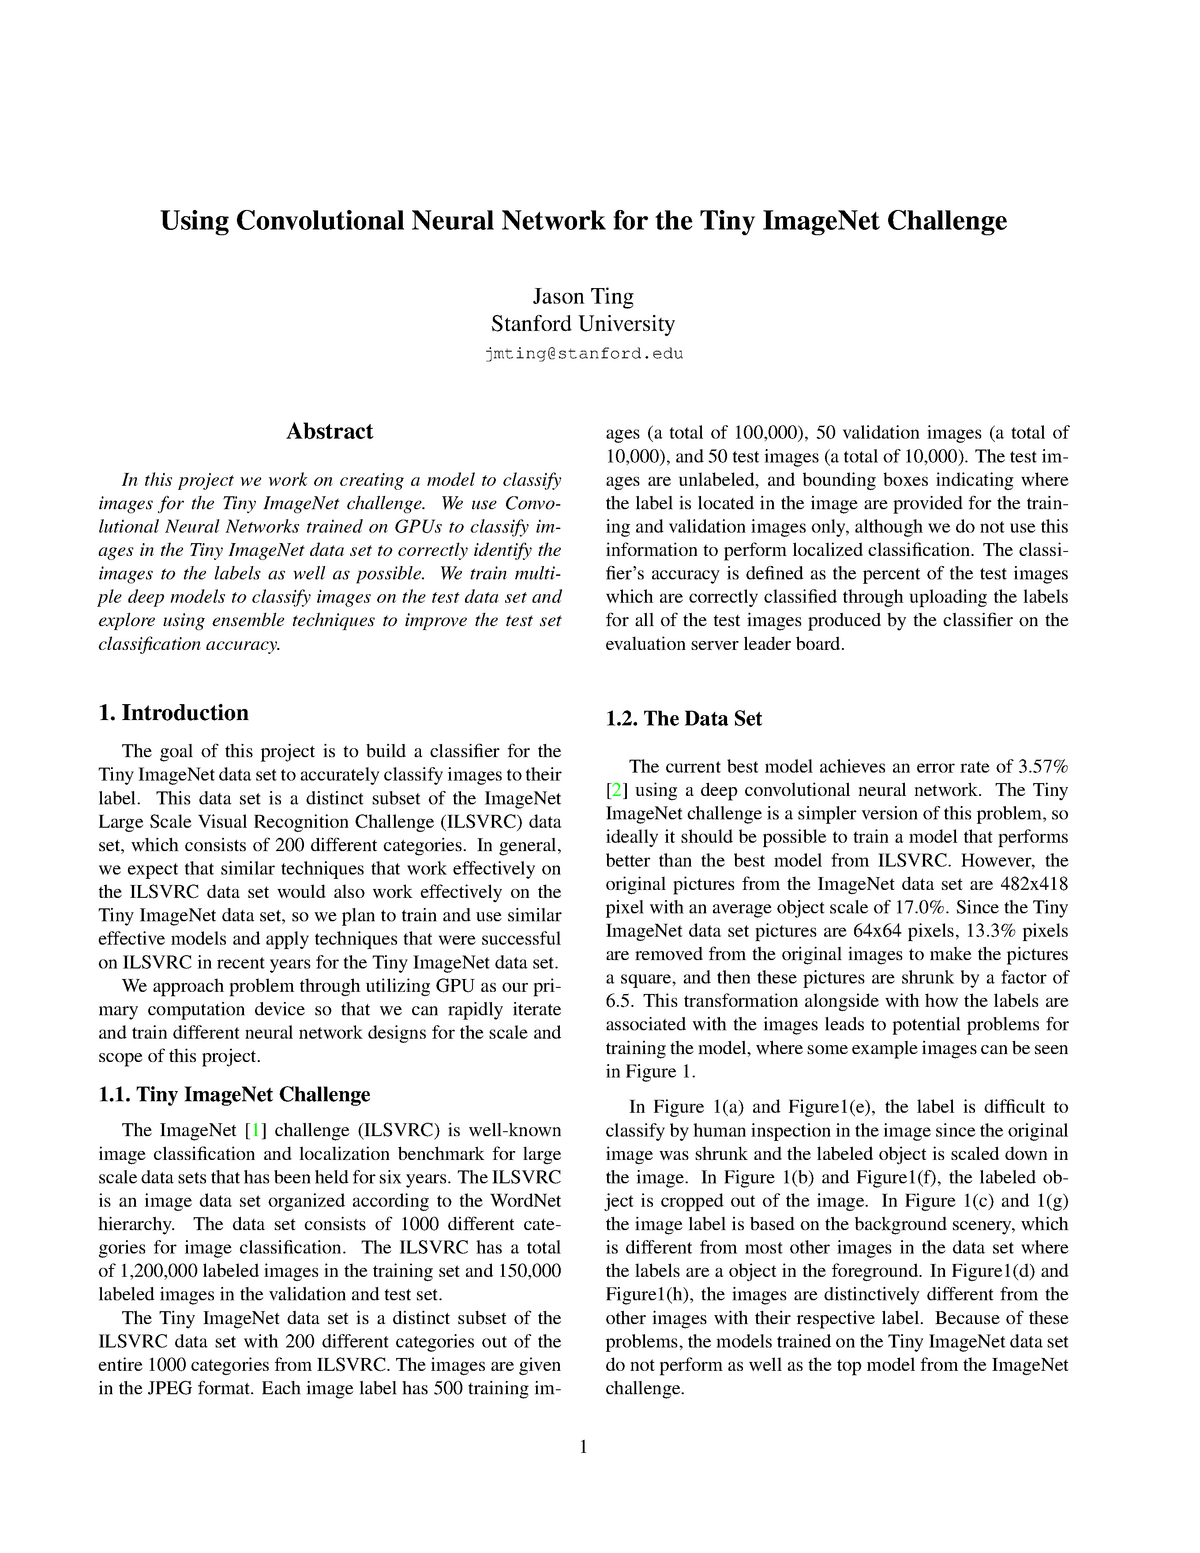 Using convolutional neural network for the tiny imagenet